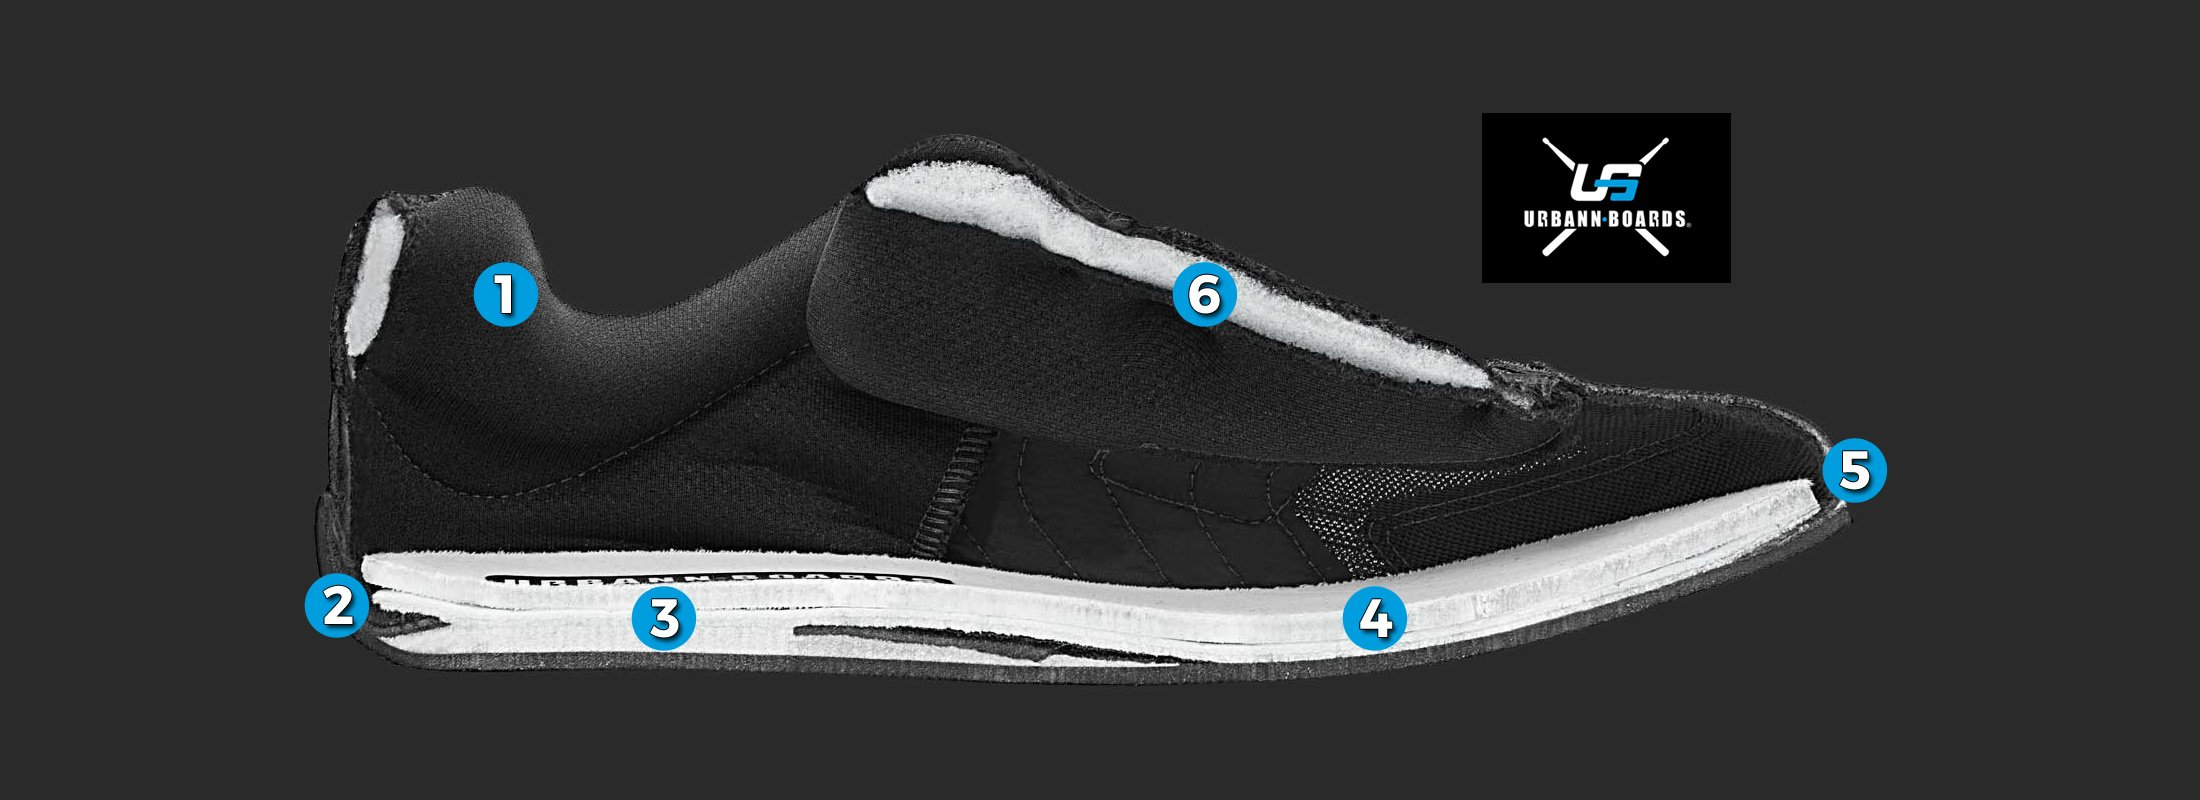 Urbann Boards ''Neil Peart Signature Shoe, Black-Gold 10''